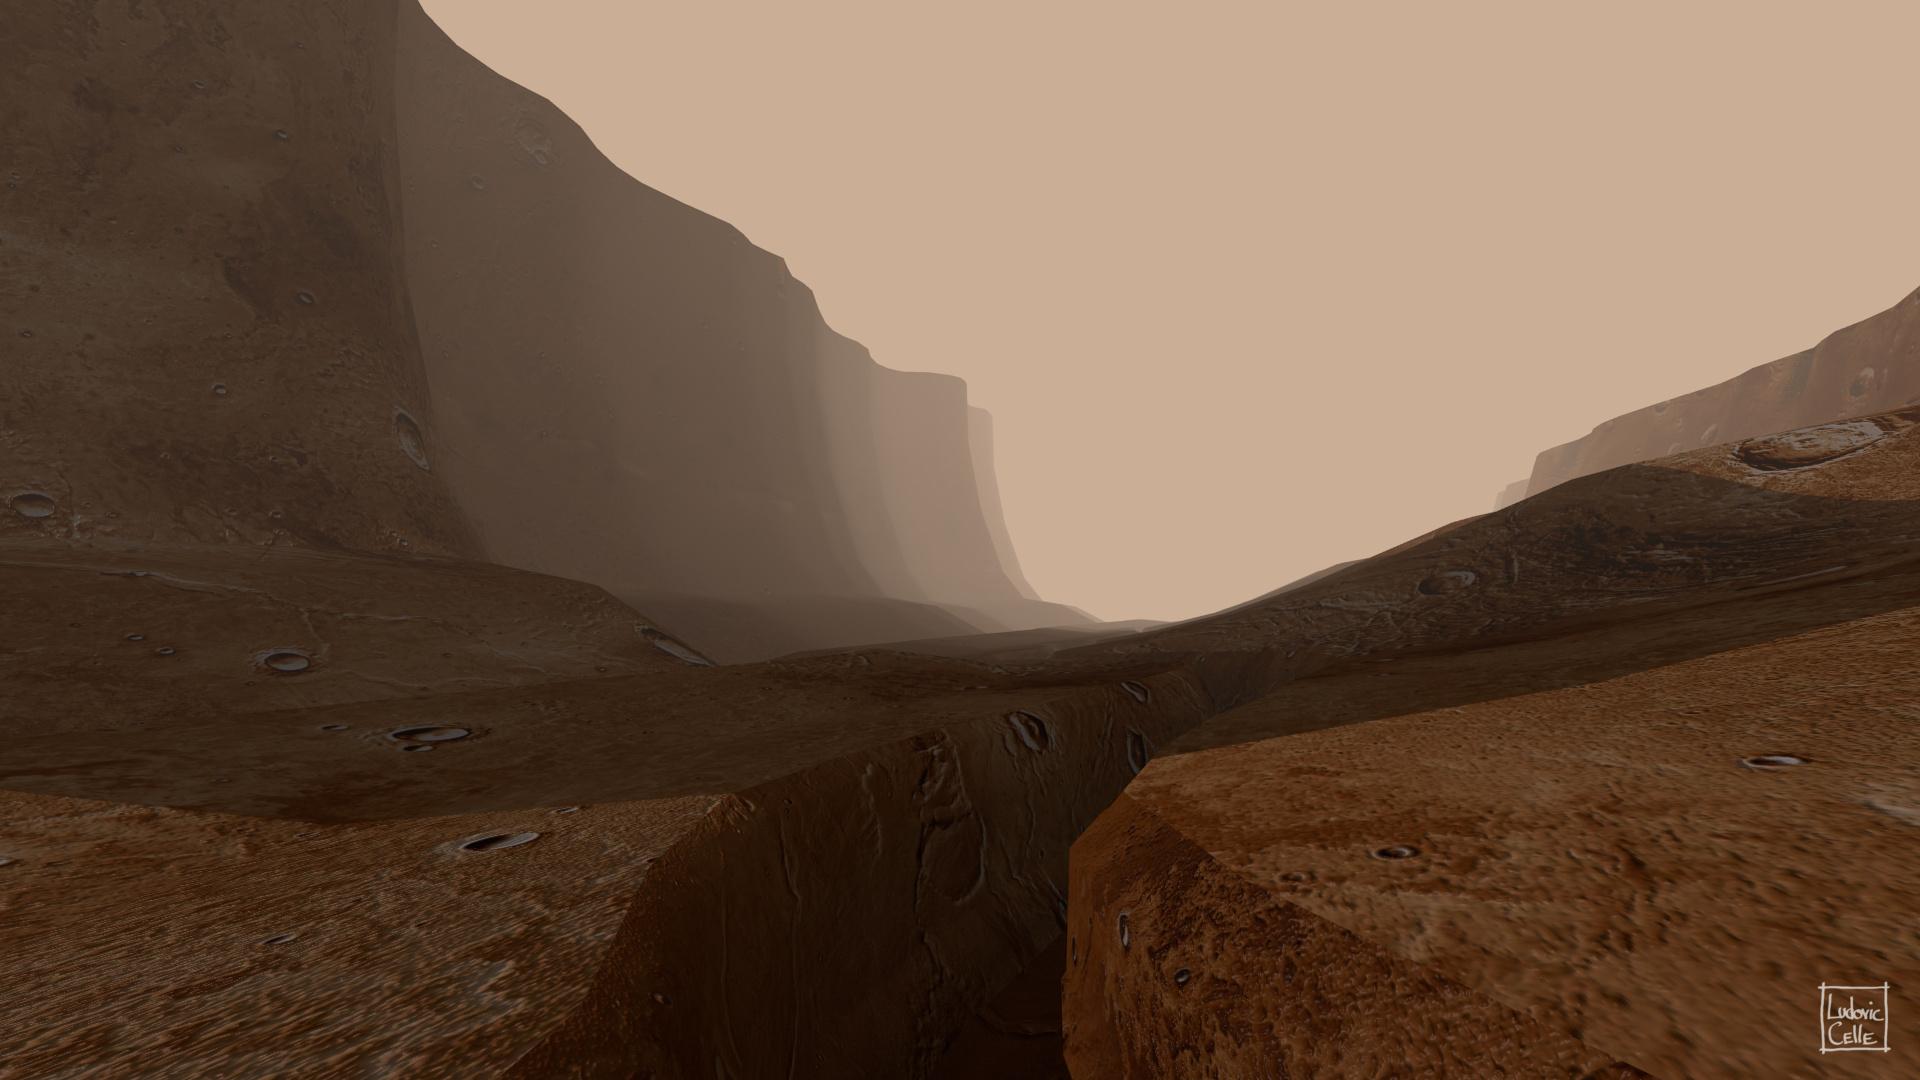 mars canyon nasa - photo #14